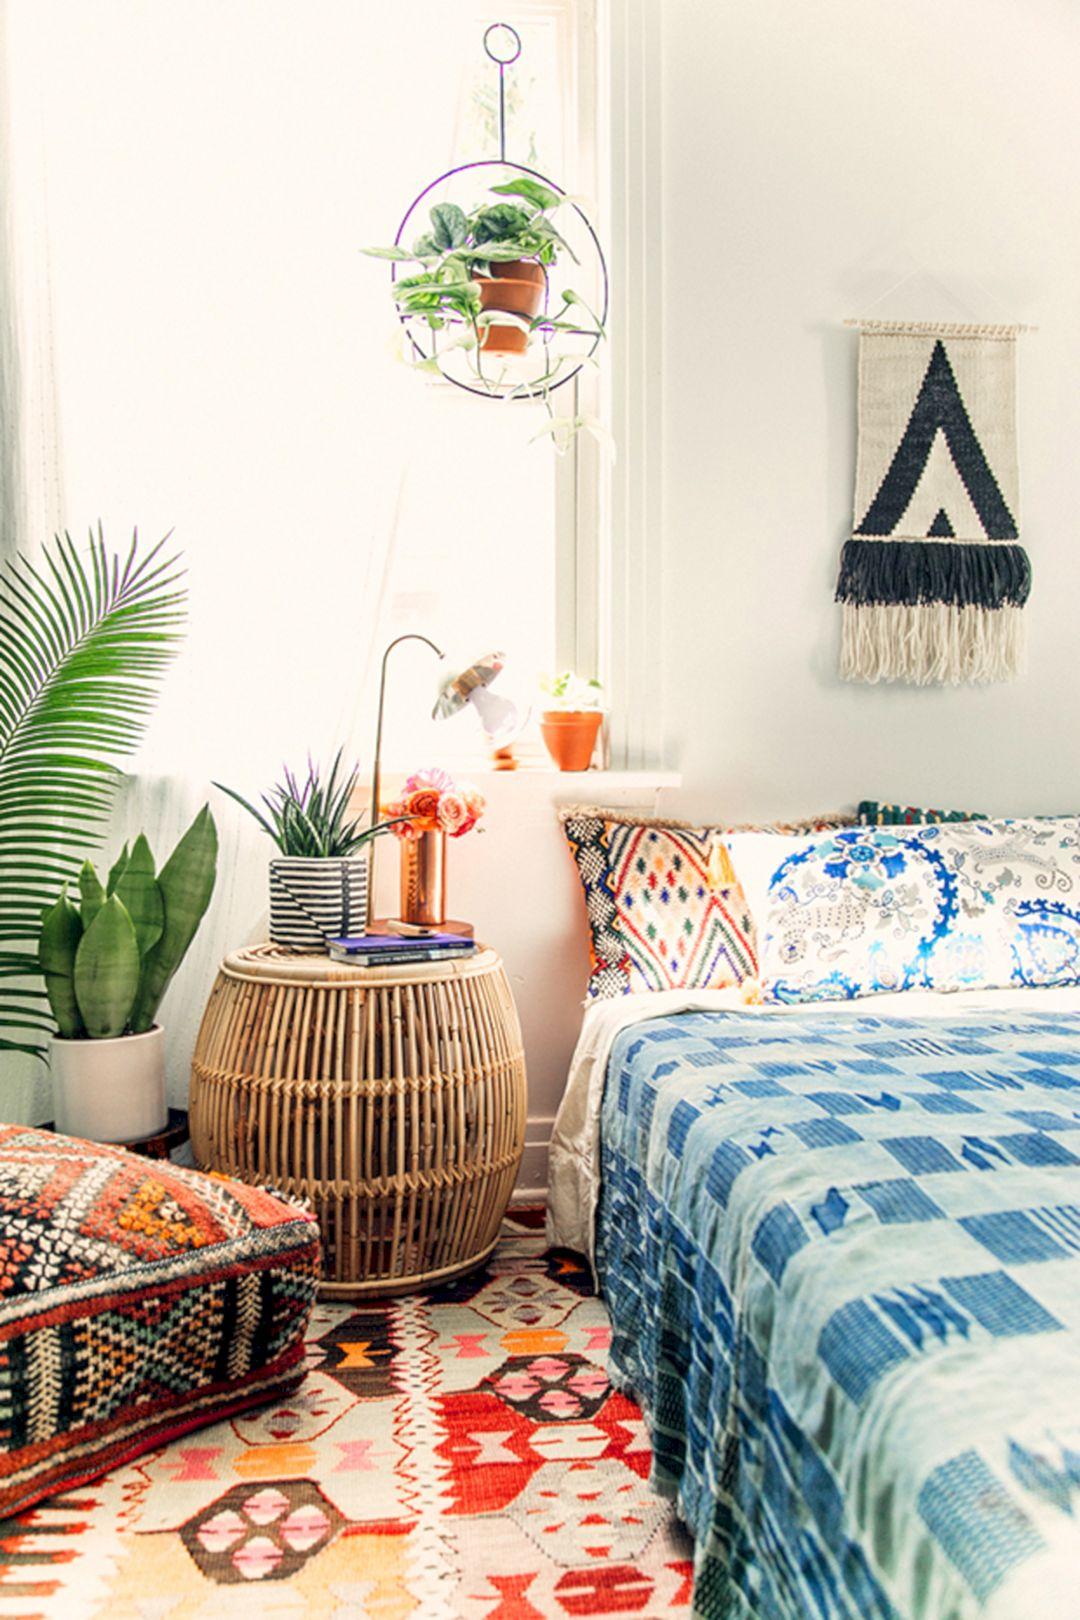 beautiful urban bedroom 8 beautiful urban bedroom 8 design ideas and photos. Black Bedroom Furniture Sets. Home Design Ideas